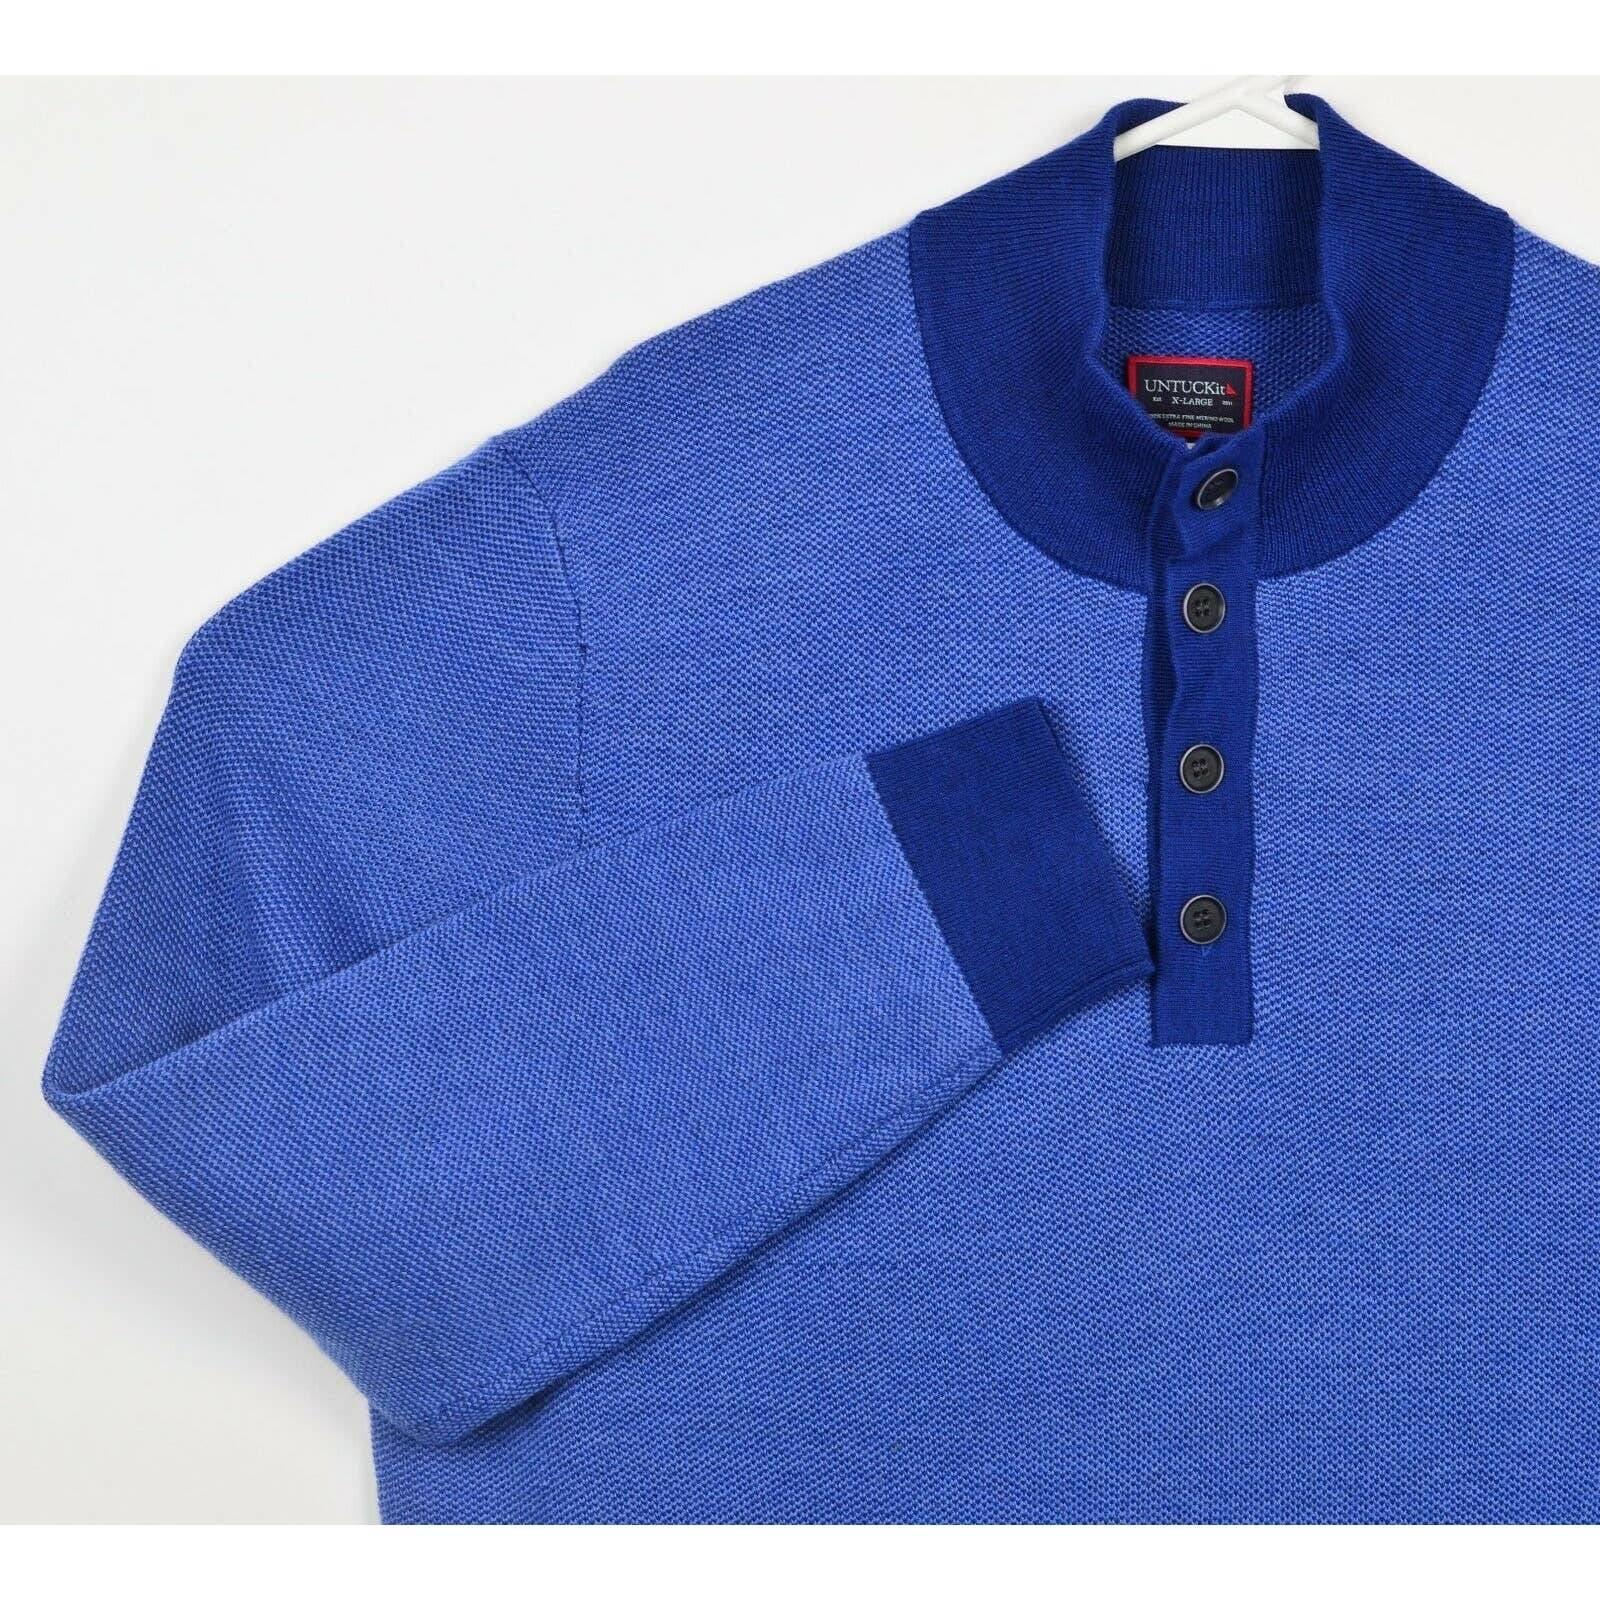 UNTUCKit Men's XL Merino Blue Sweater